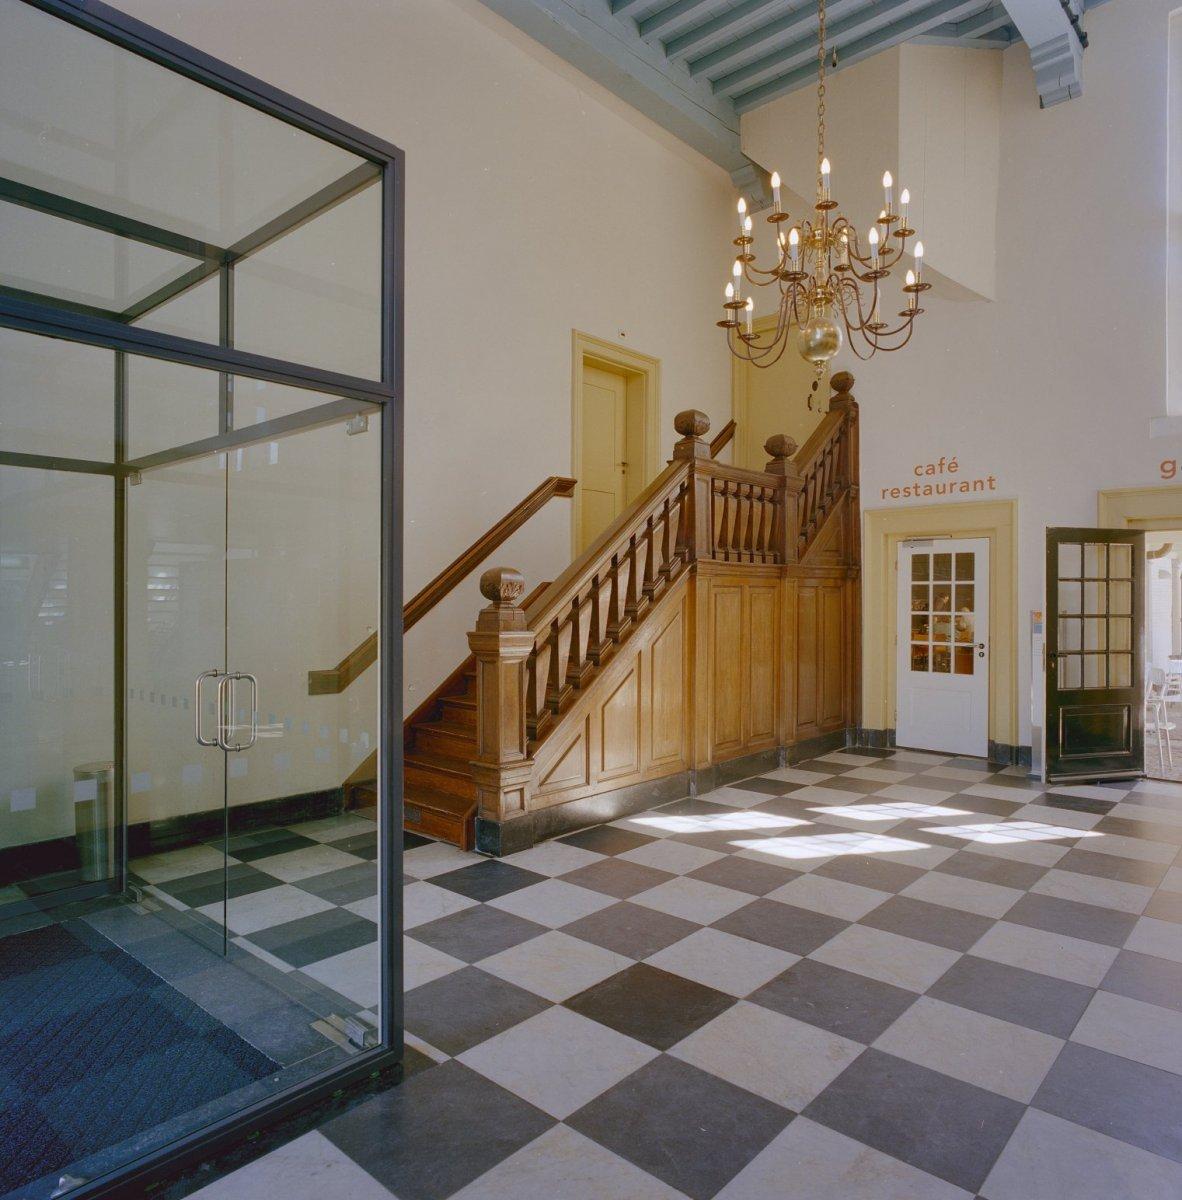 File interieur hal overzicht houten trap leiden 20338226 wikimedia commons - Interieur houten trap ...